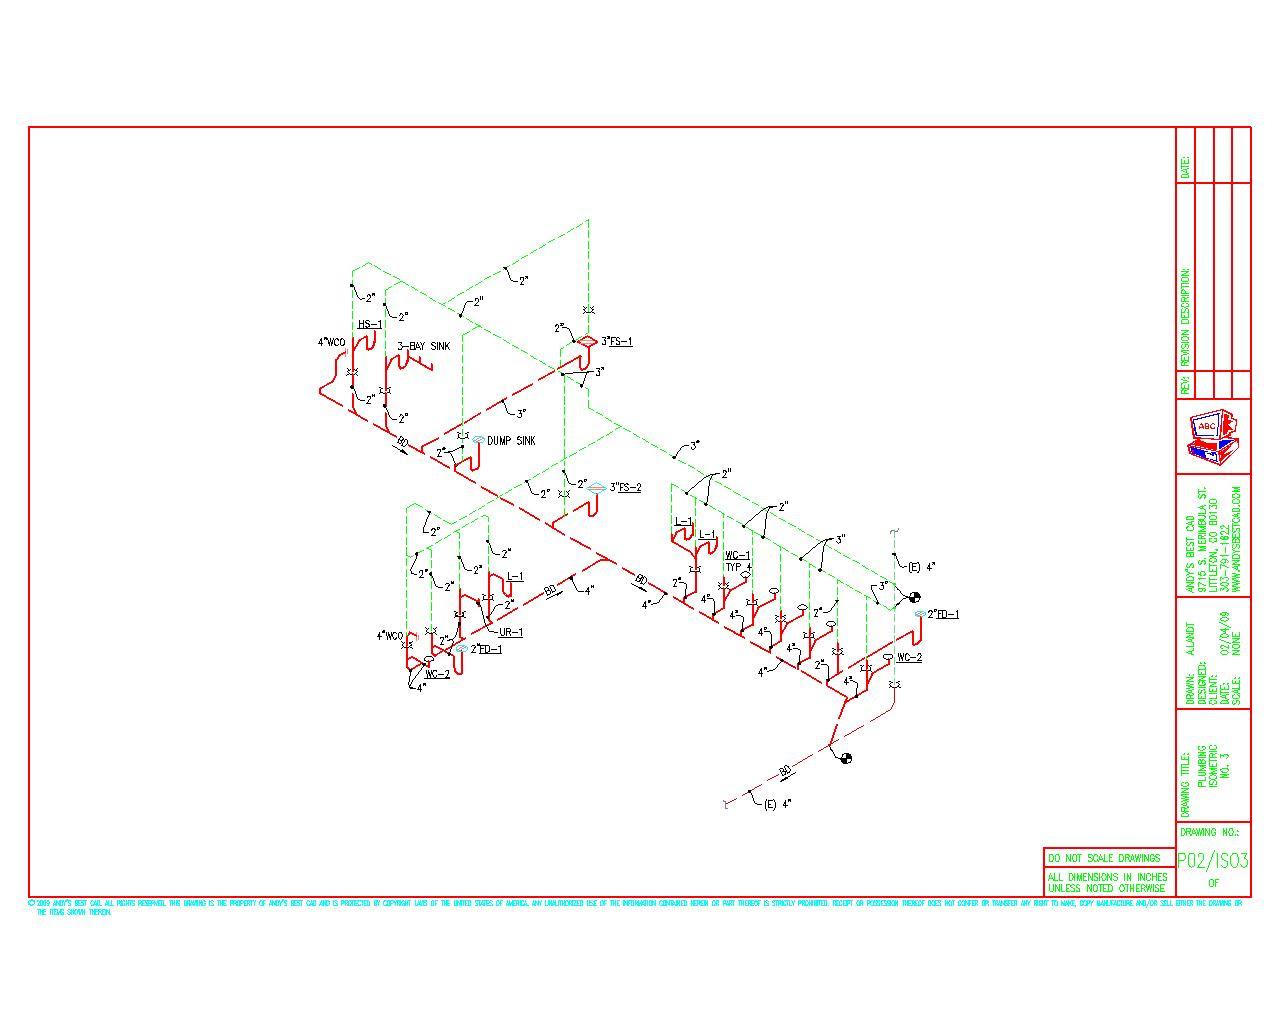 35 Plumbing Riser Diagram Symbols